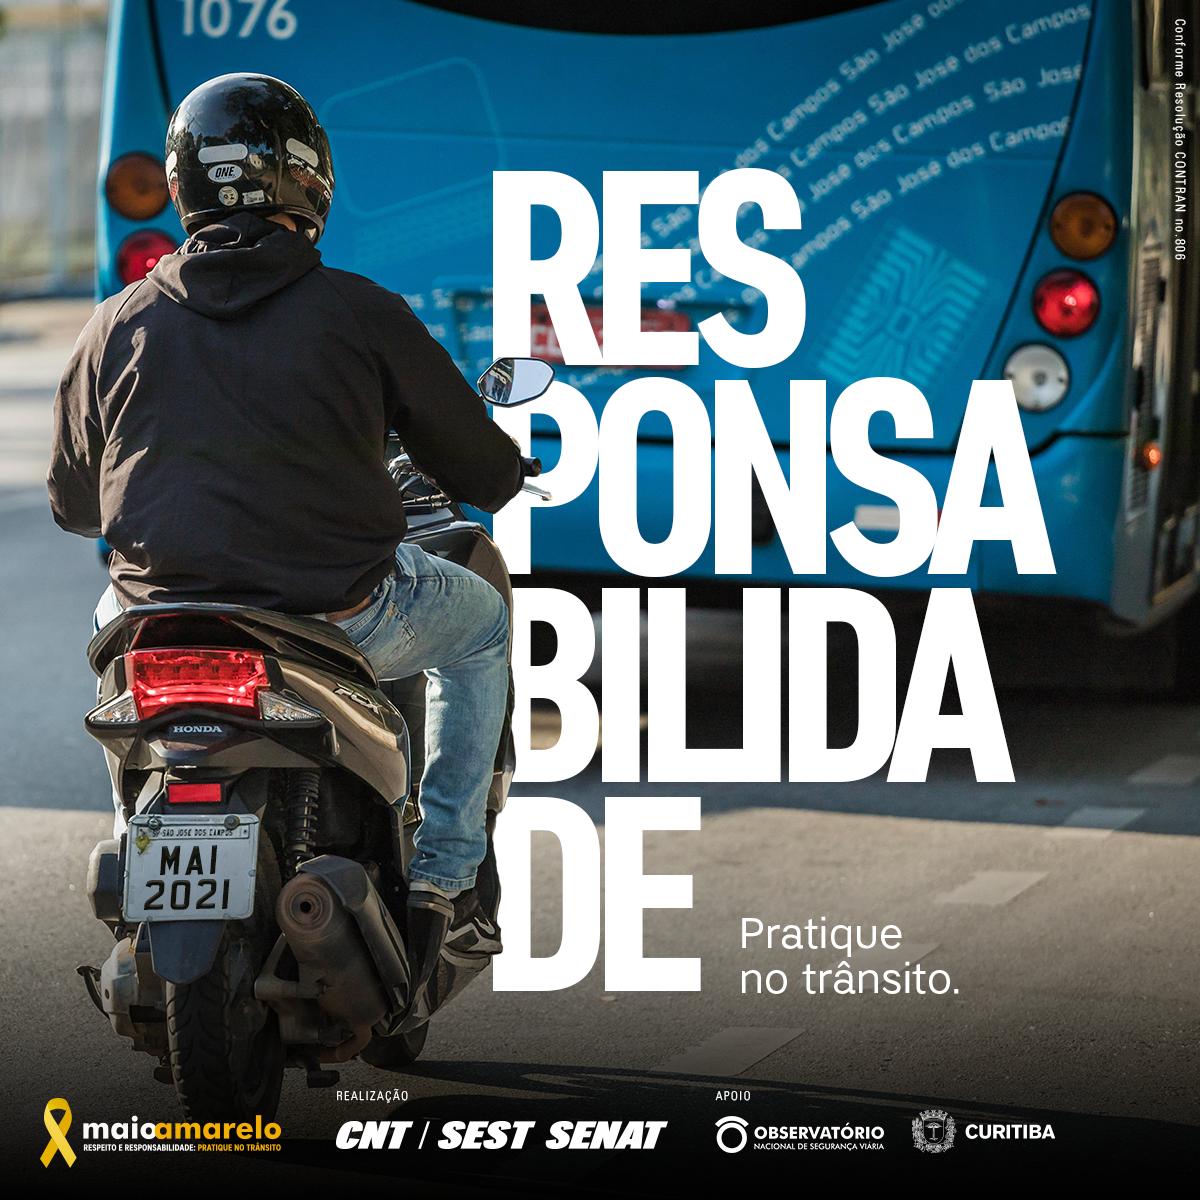 Responsabilidade - Motociclista